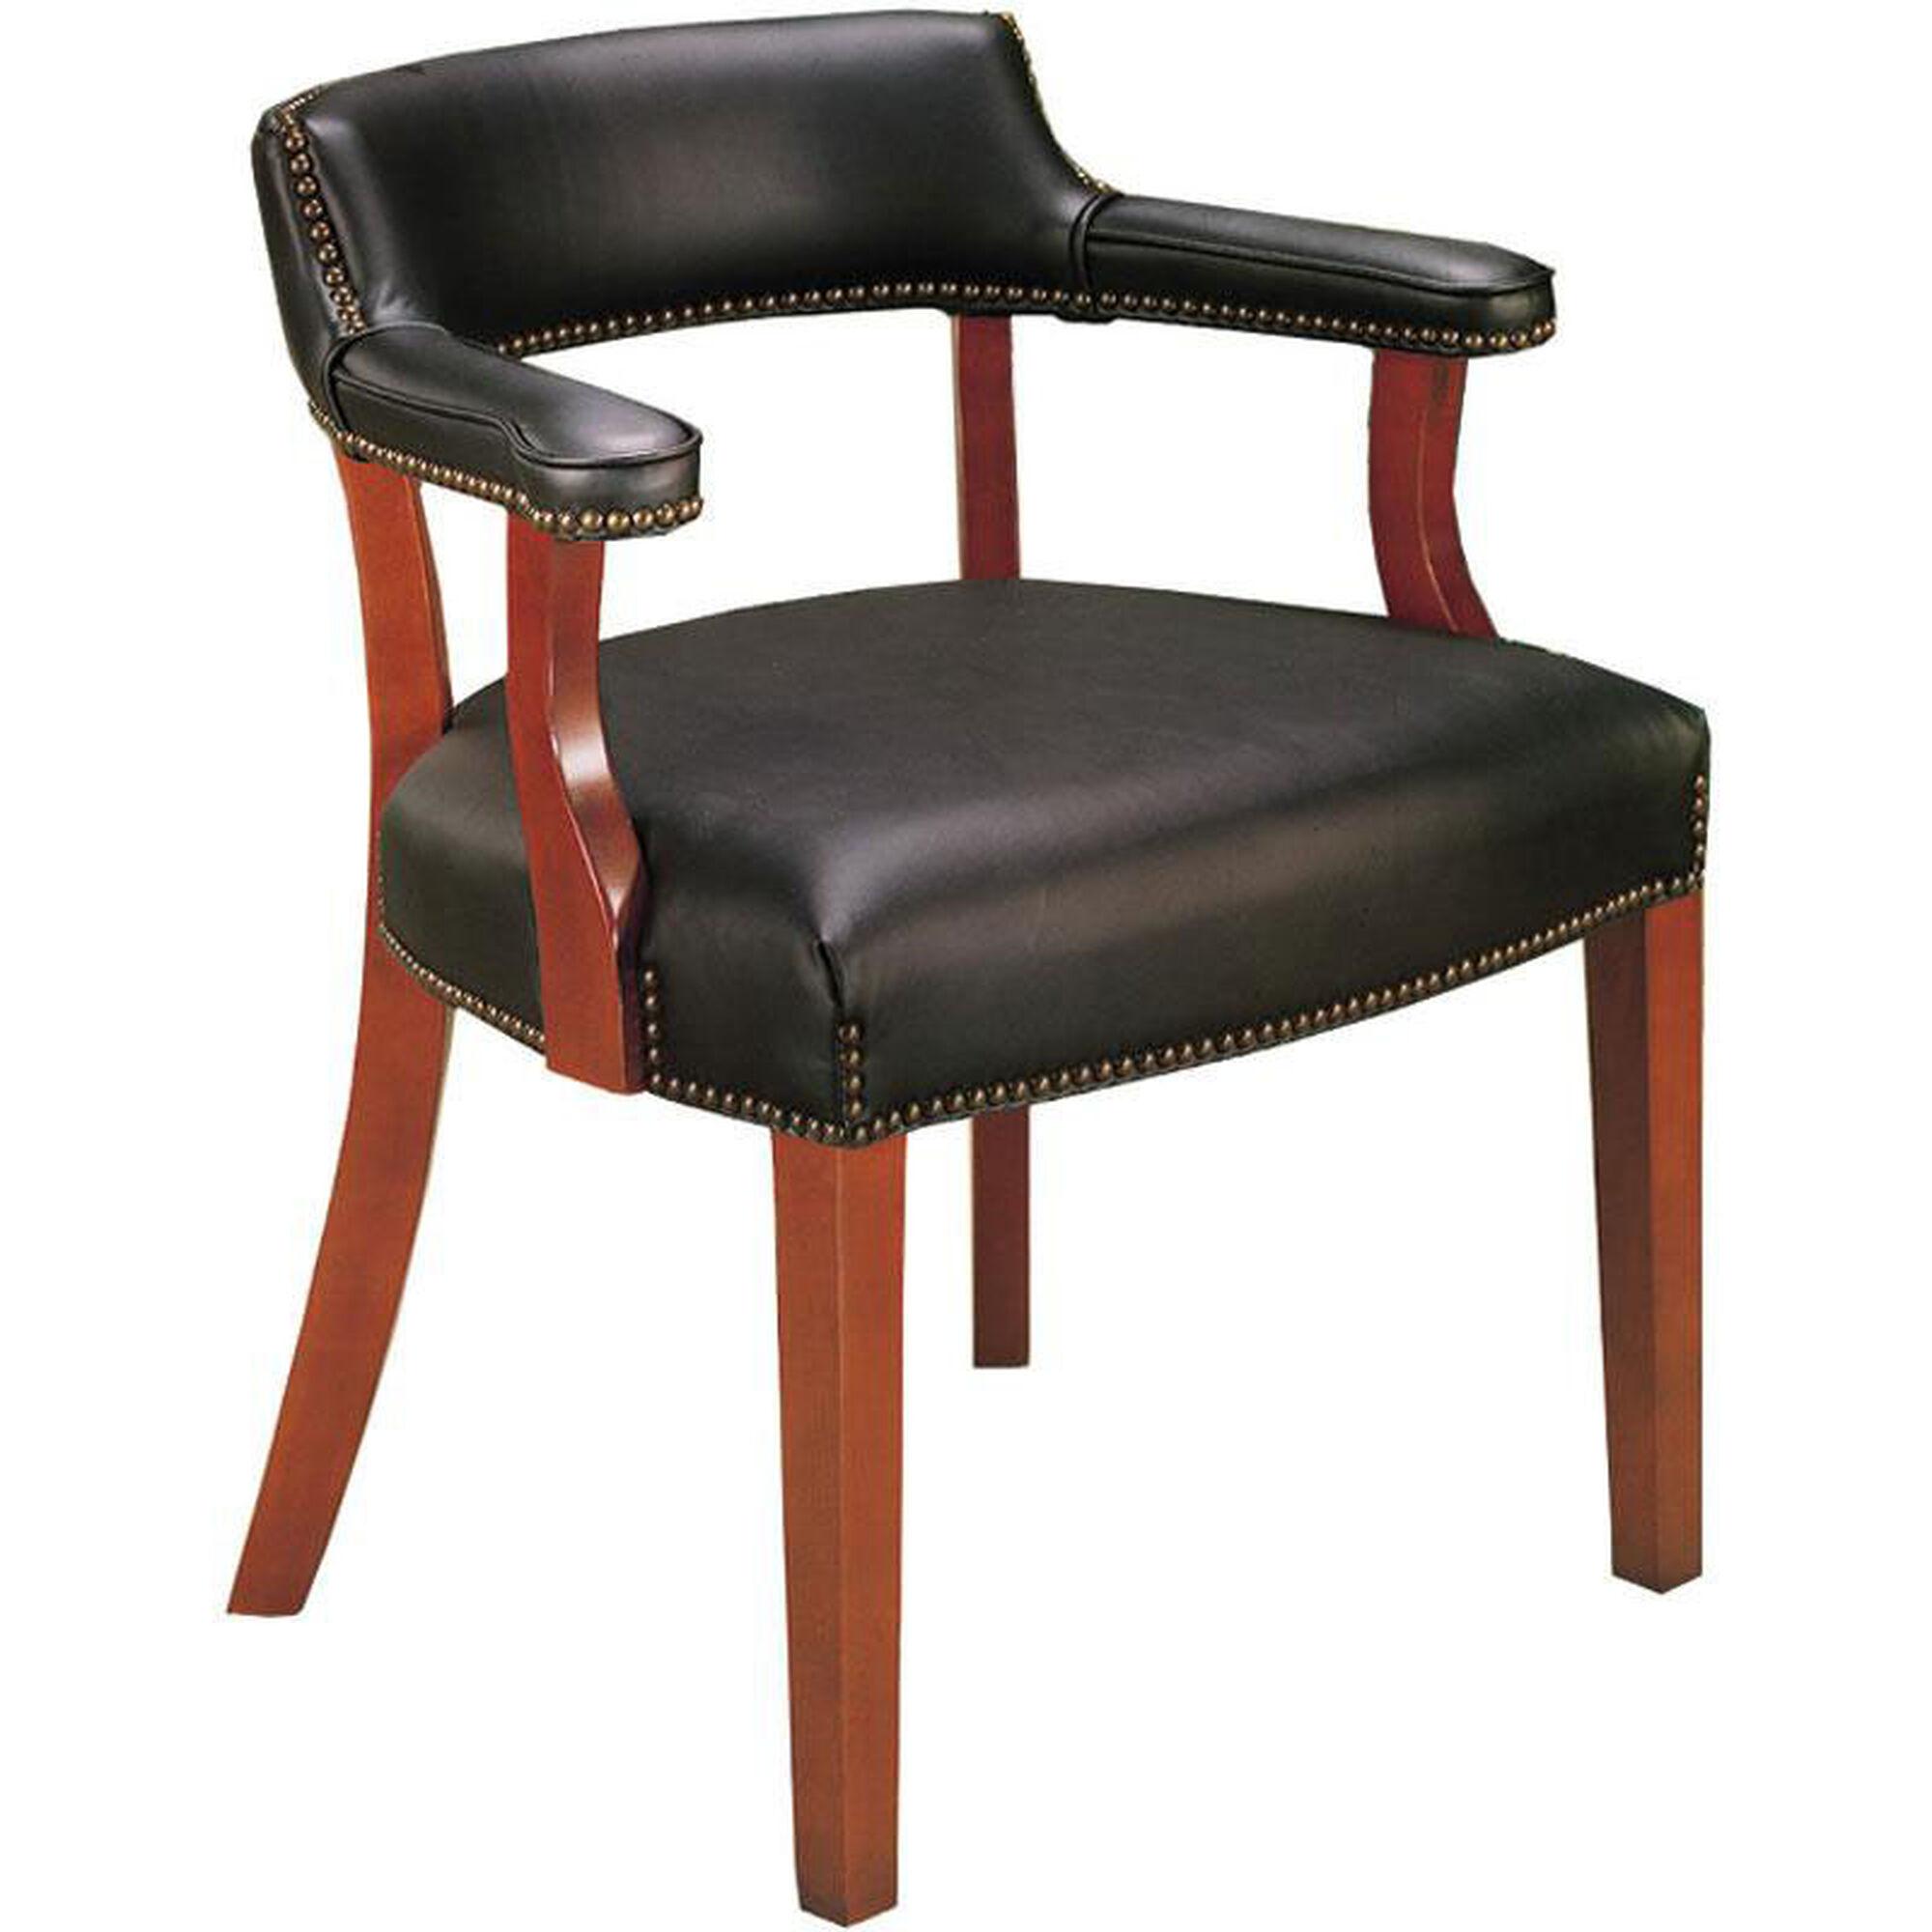 High Point Furniture Industries 4013 Hpf 4013